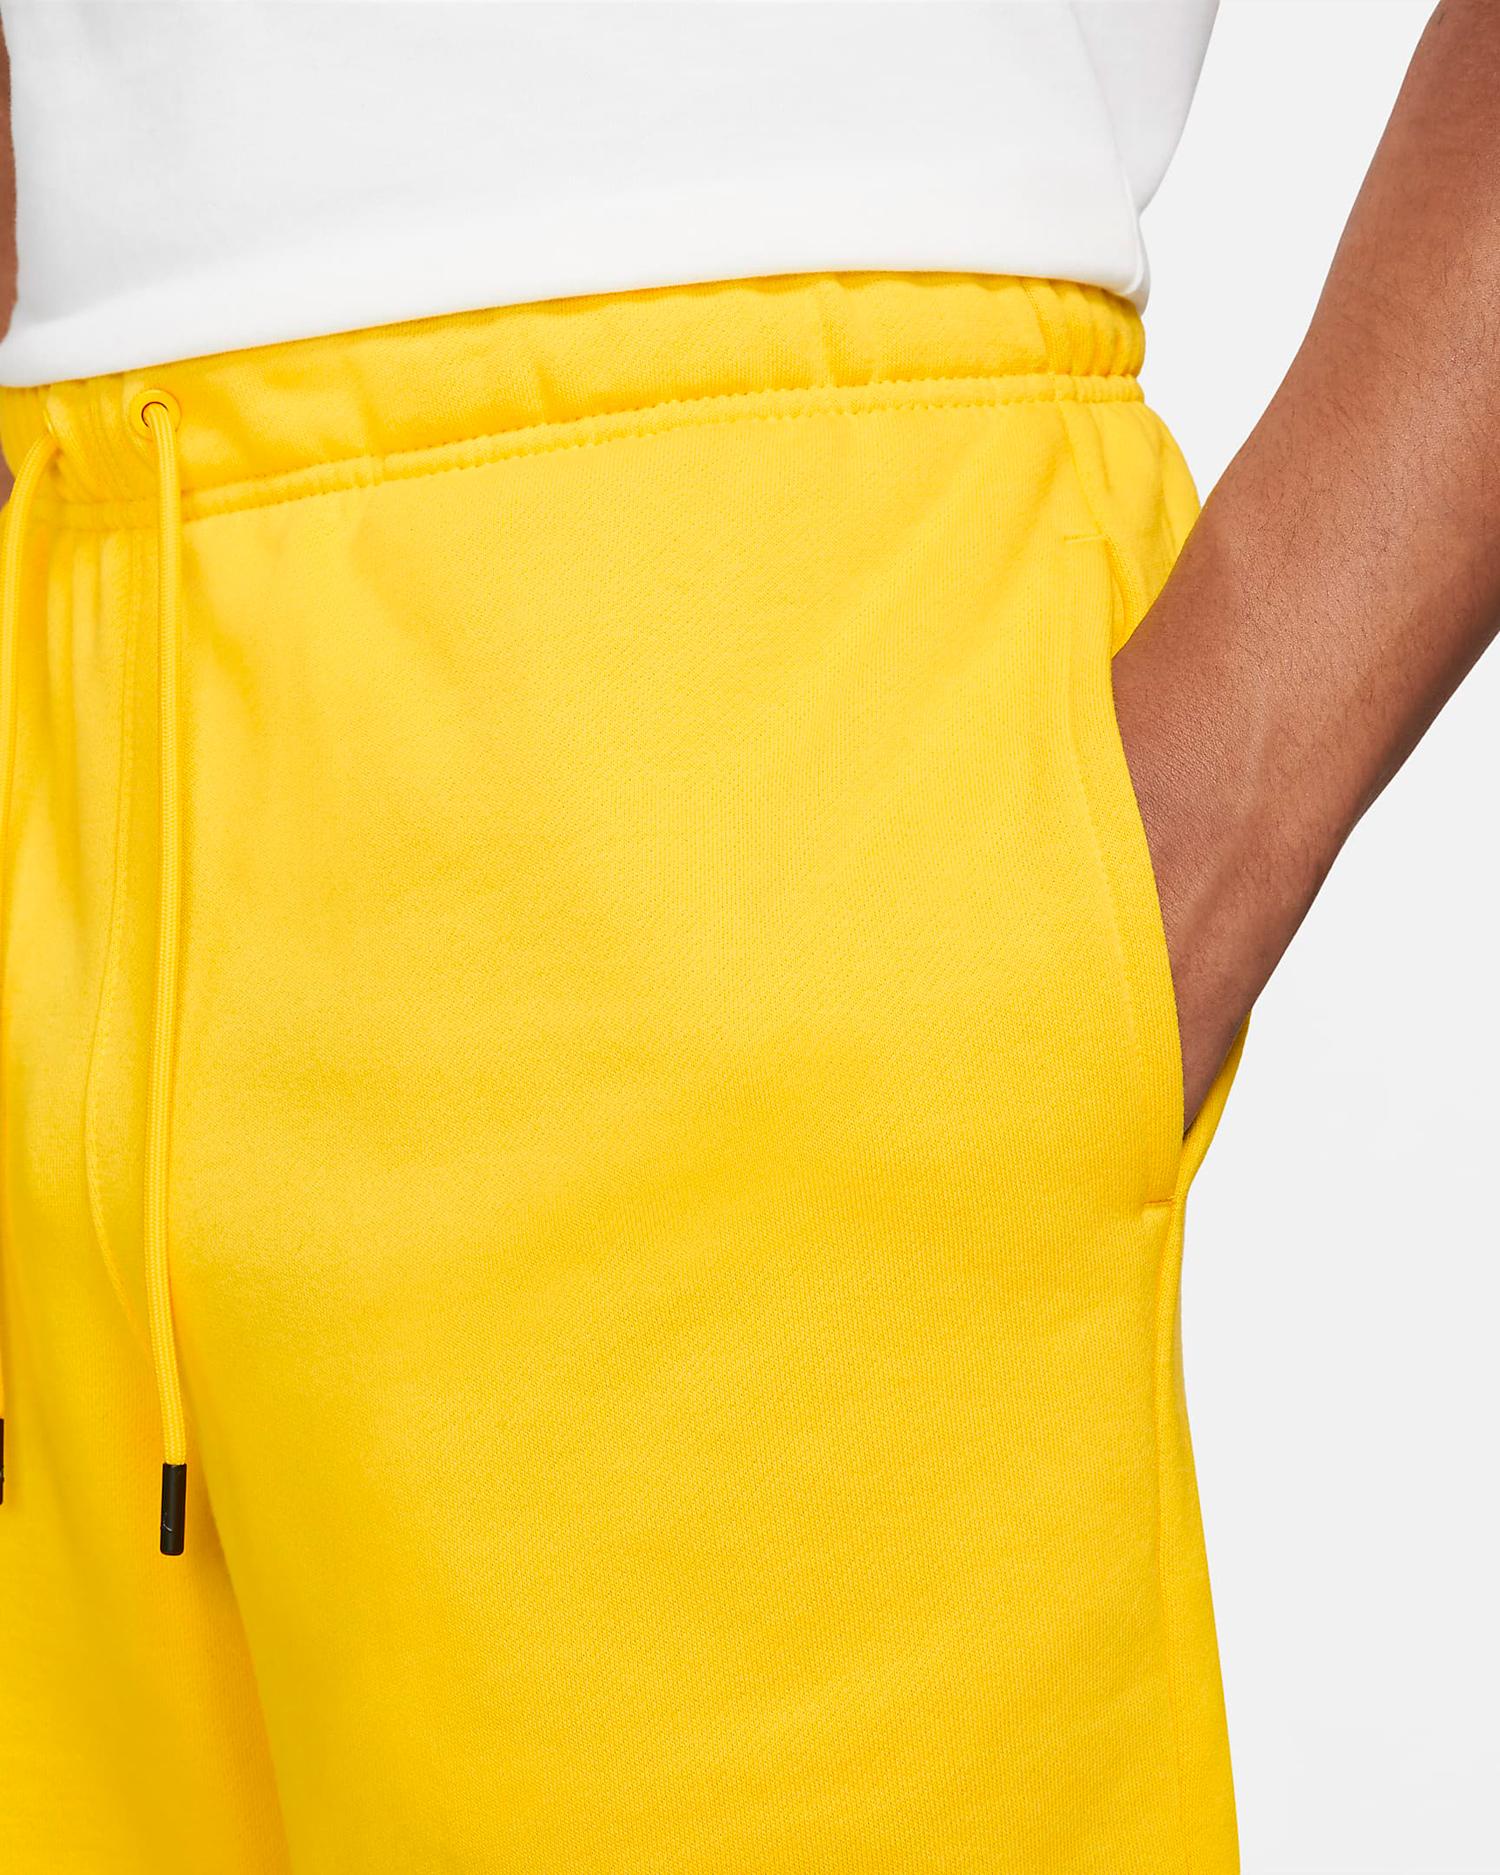 jordan-essential-fleece-shorts-tour-yellow-4